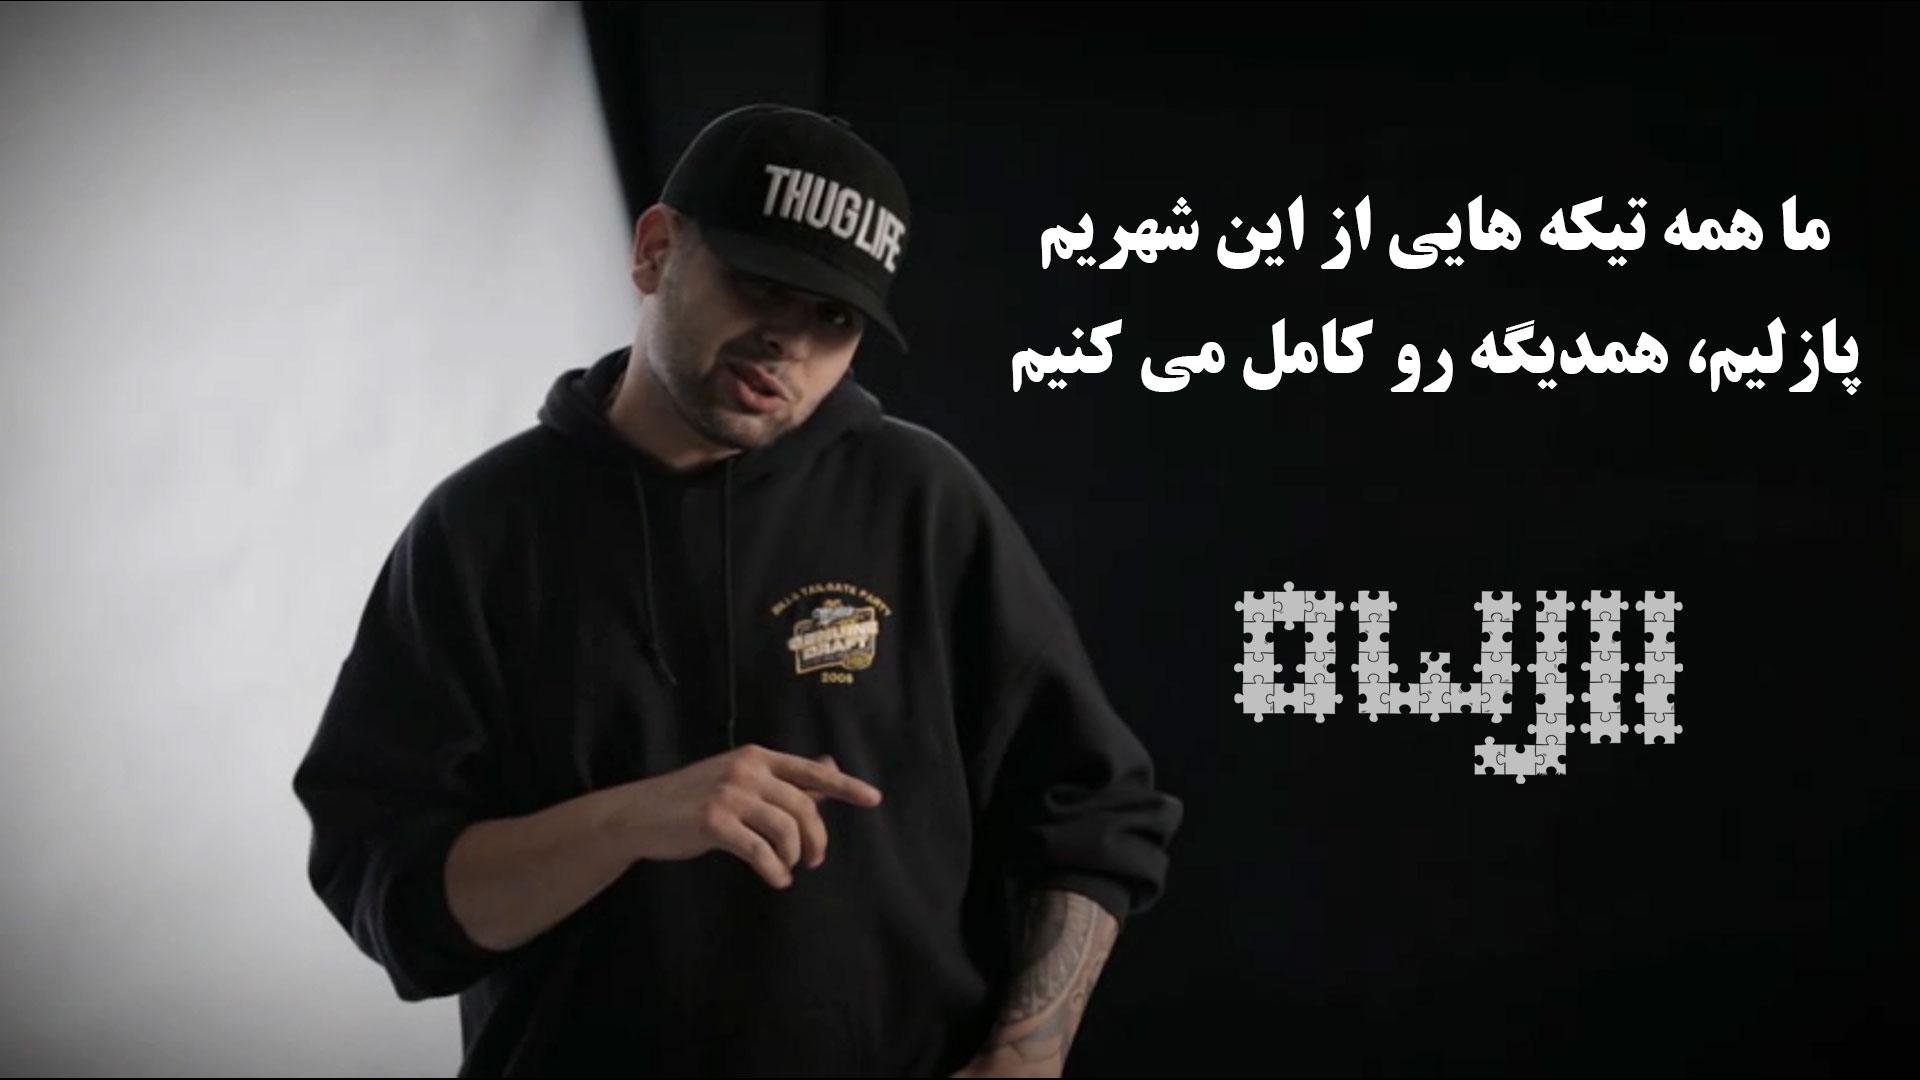 آهنگ پازل - علی اوج (اوجی)